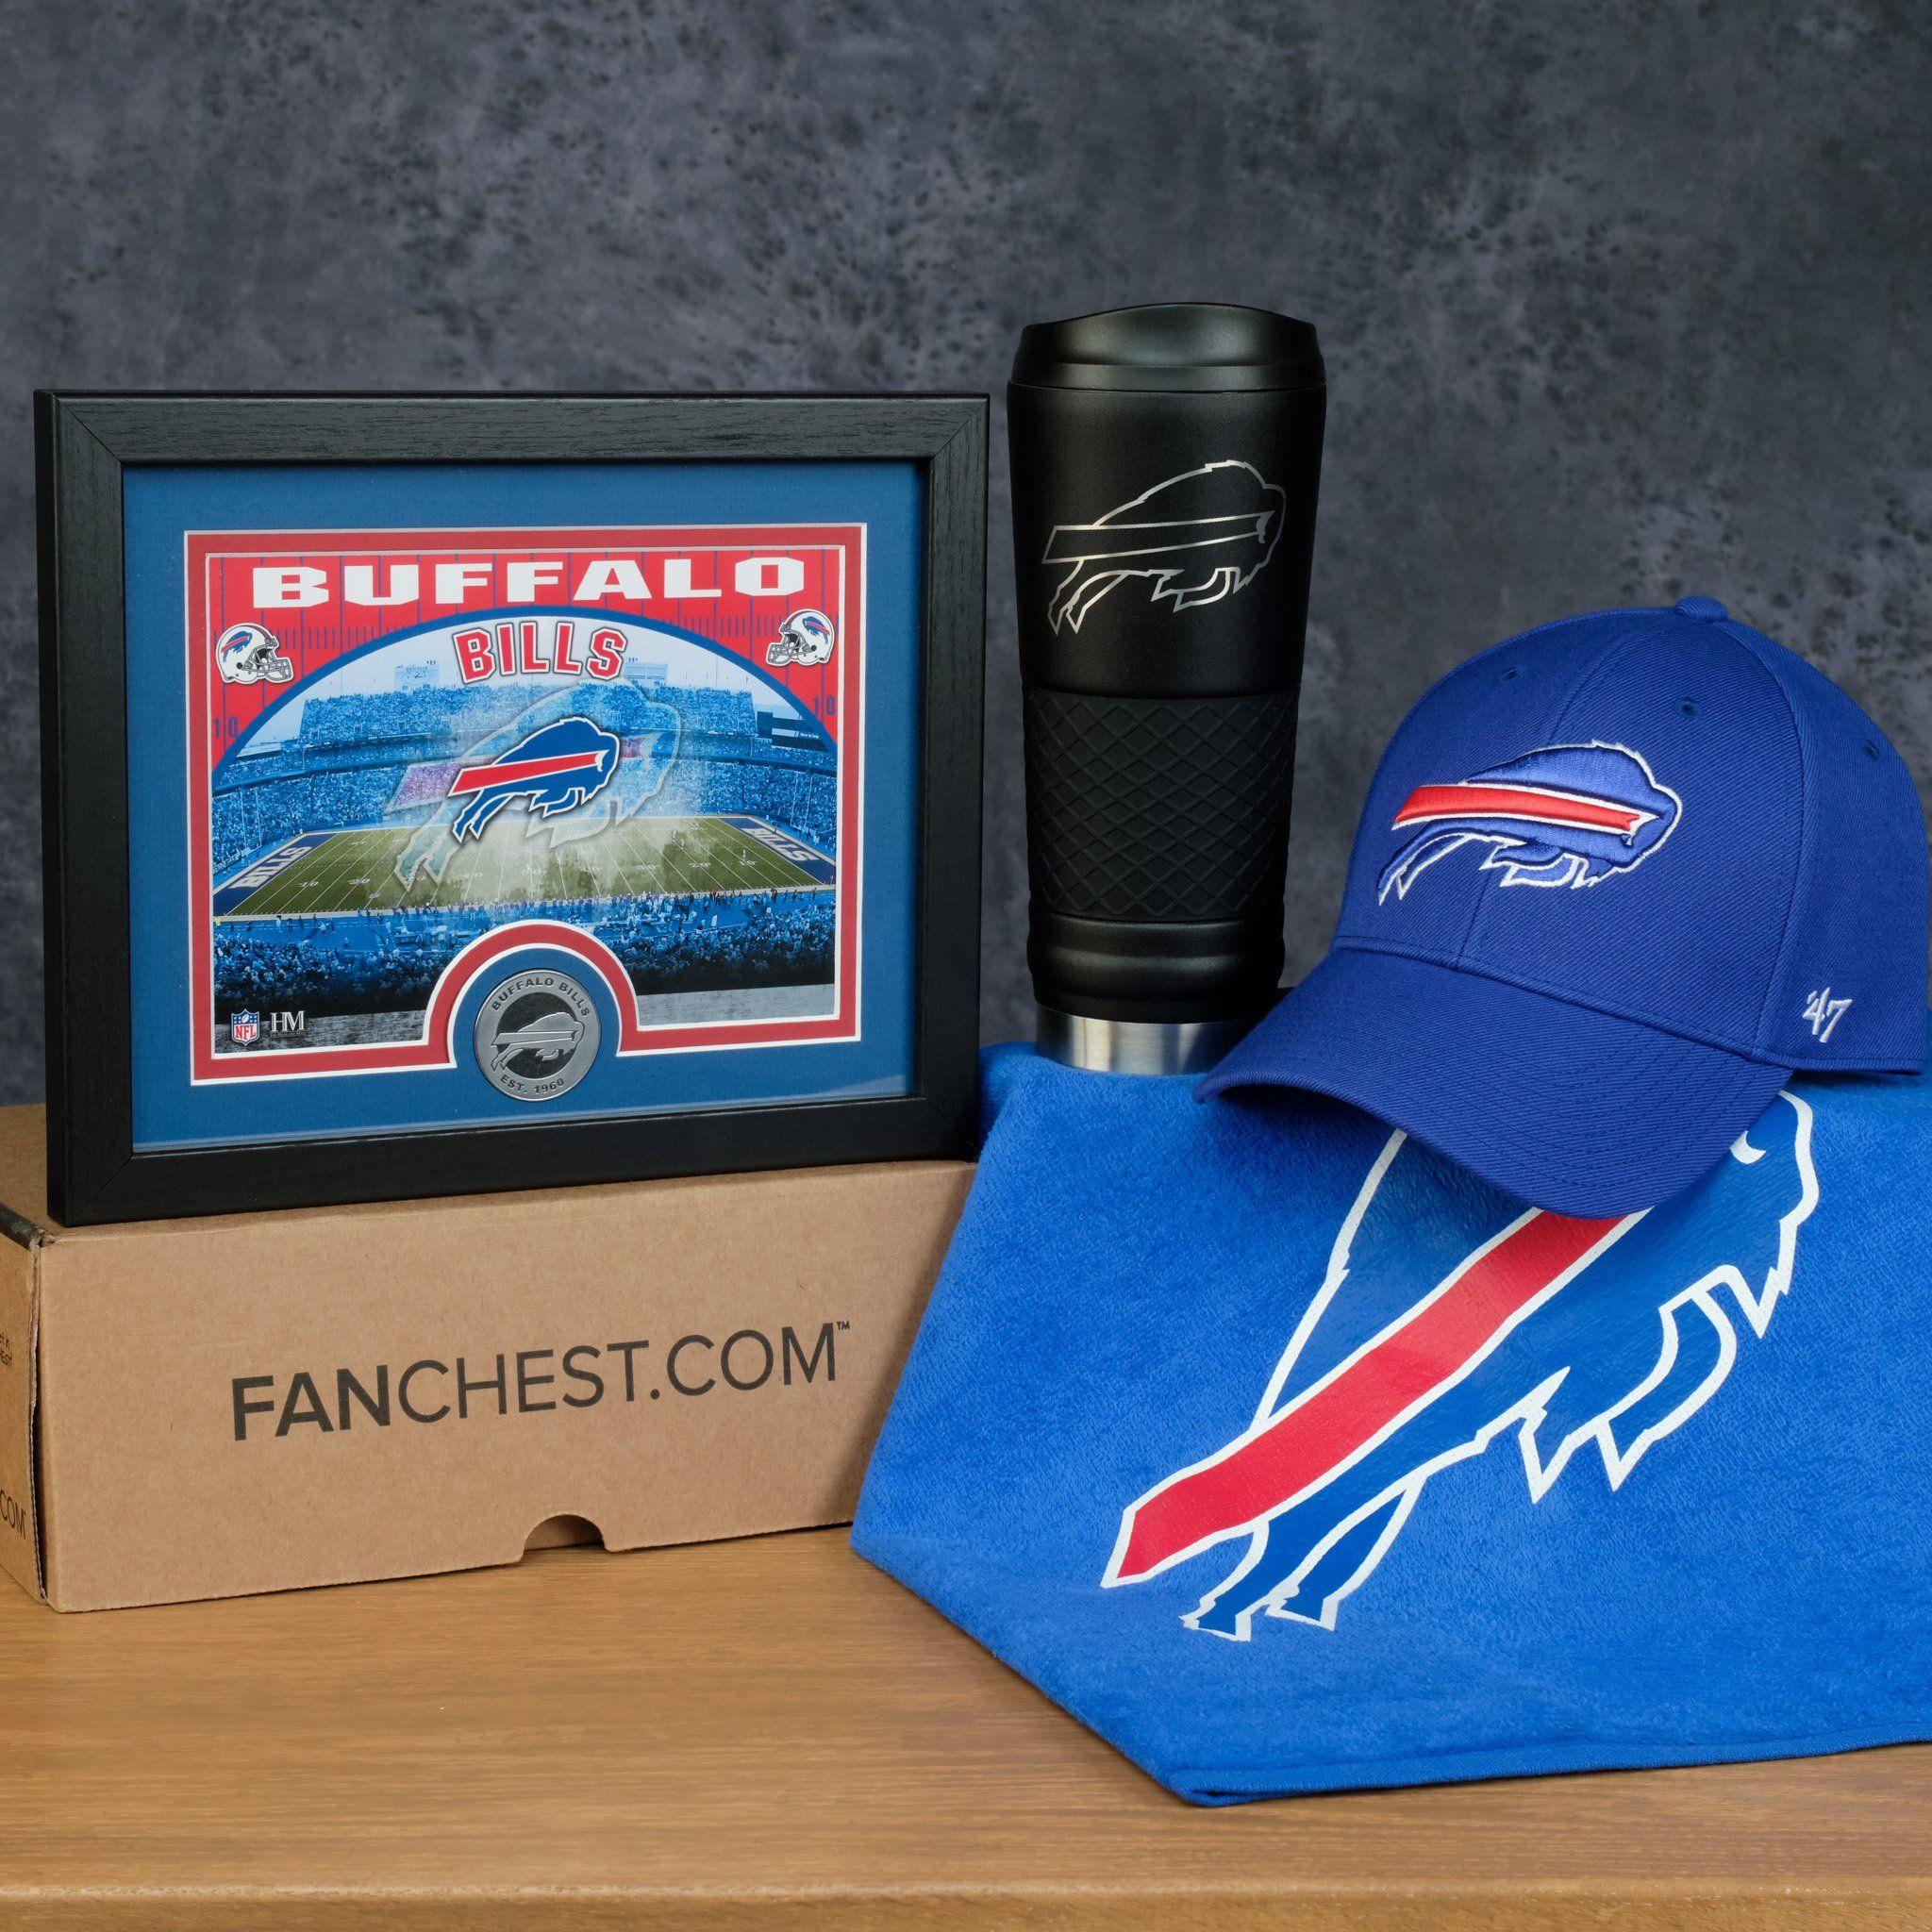 Buffalo bills gifts box premium bills gear fanchest